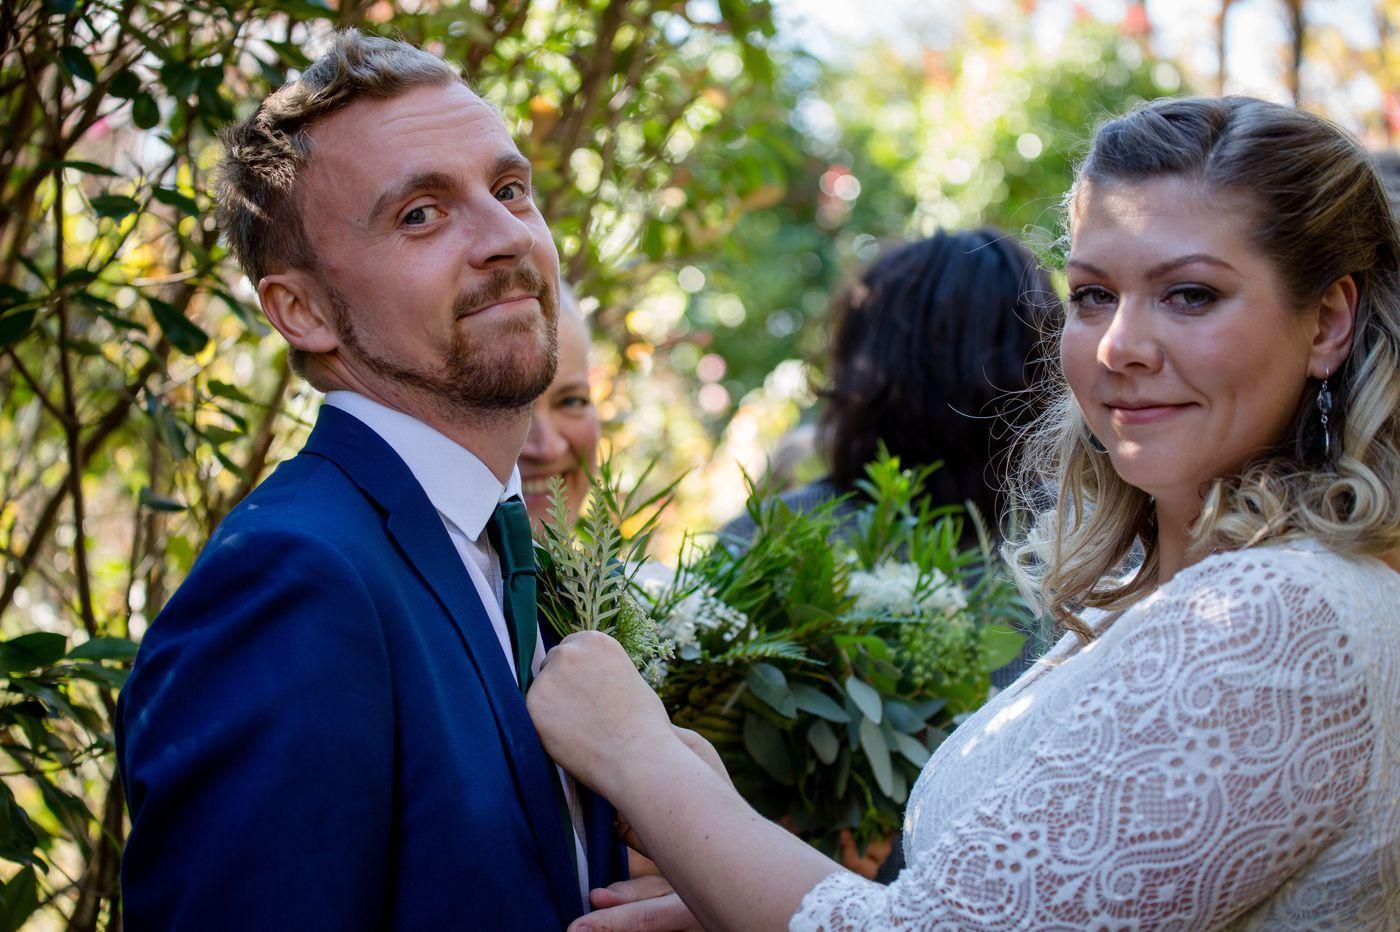 Philadelphia weddings: Mara Jefferies and Gus Hackett